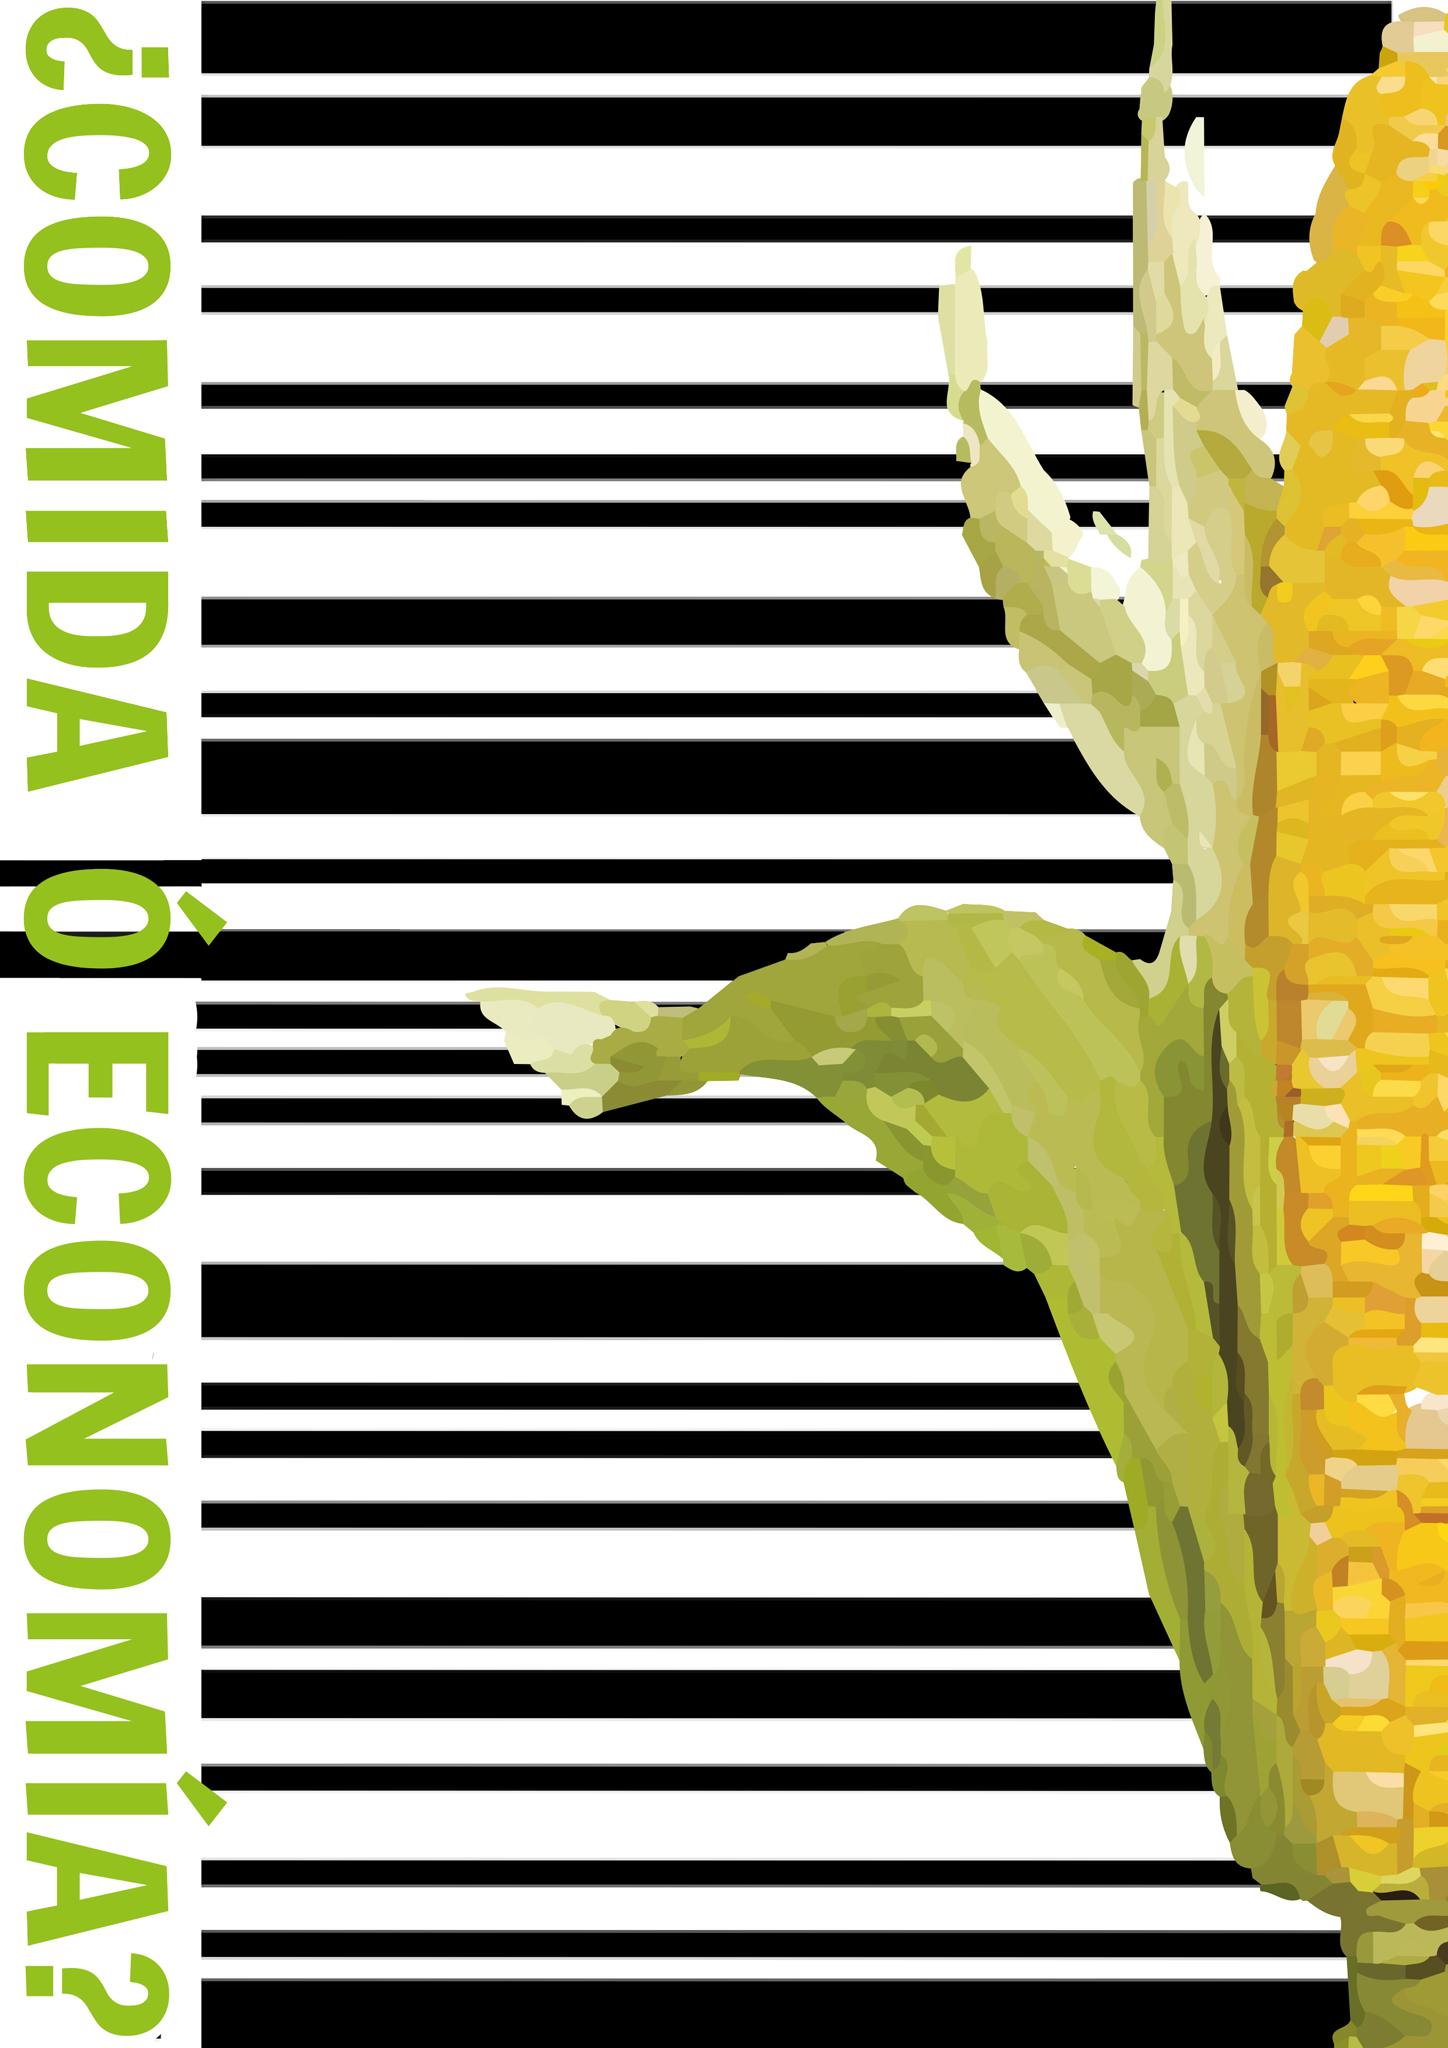 iquest comida o economia